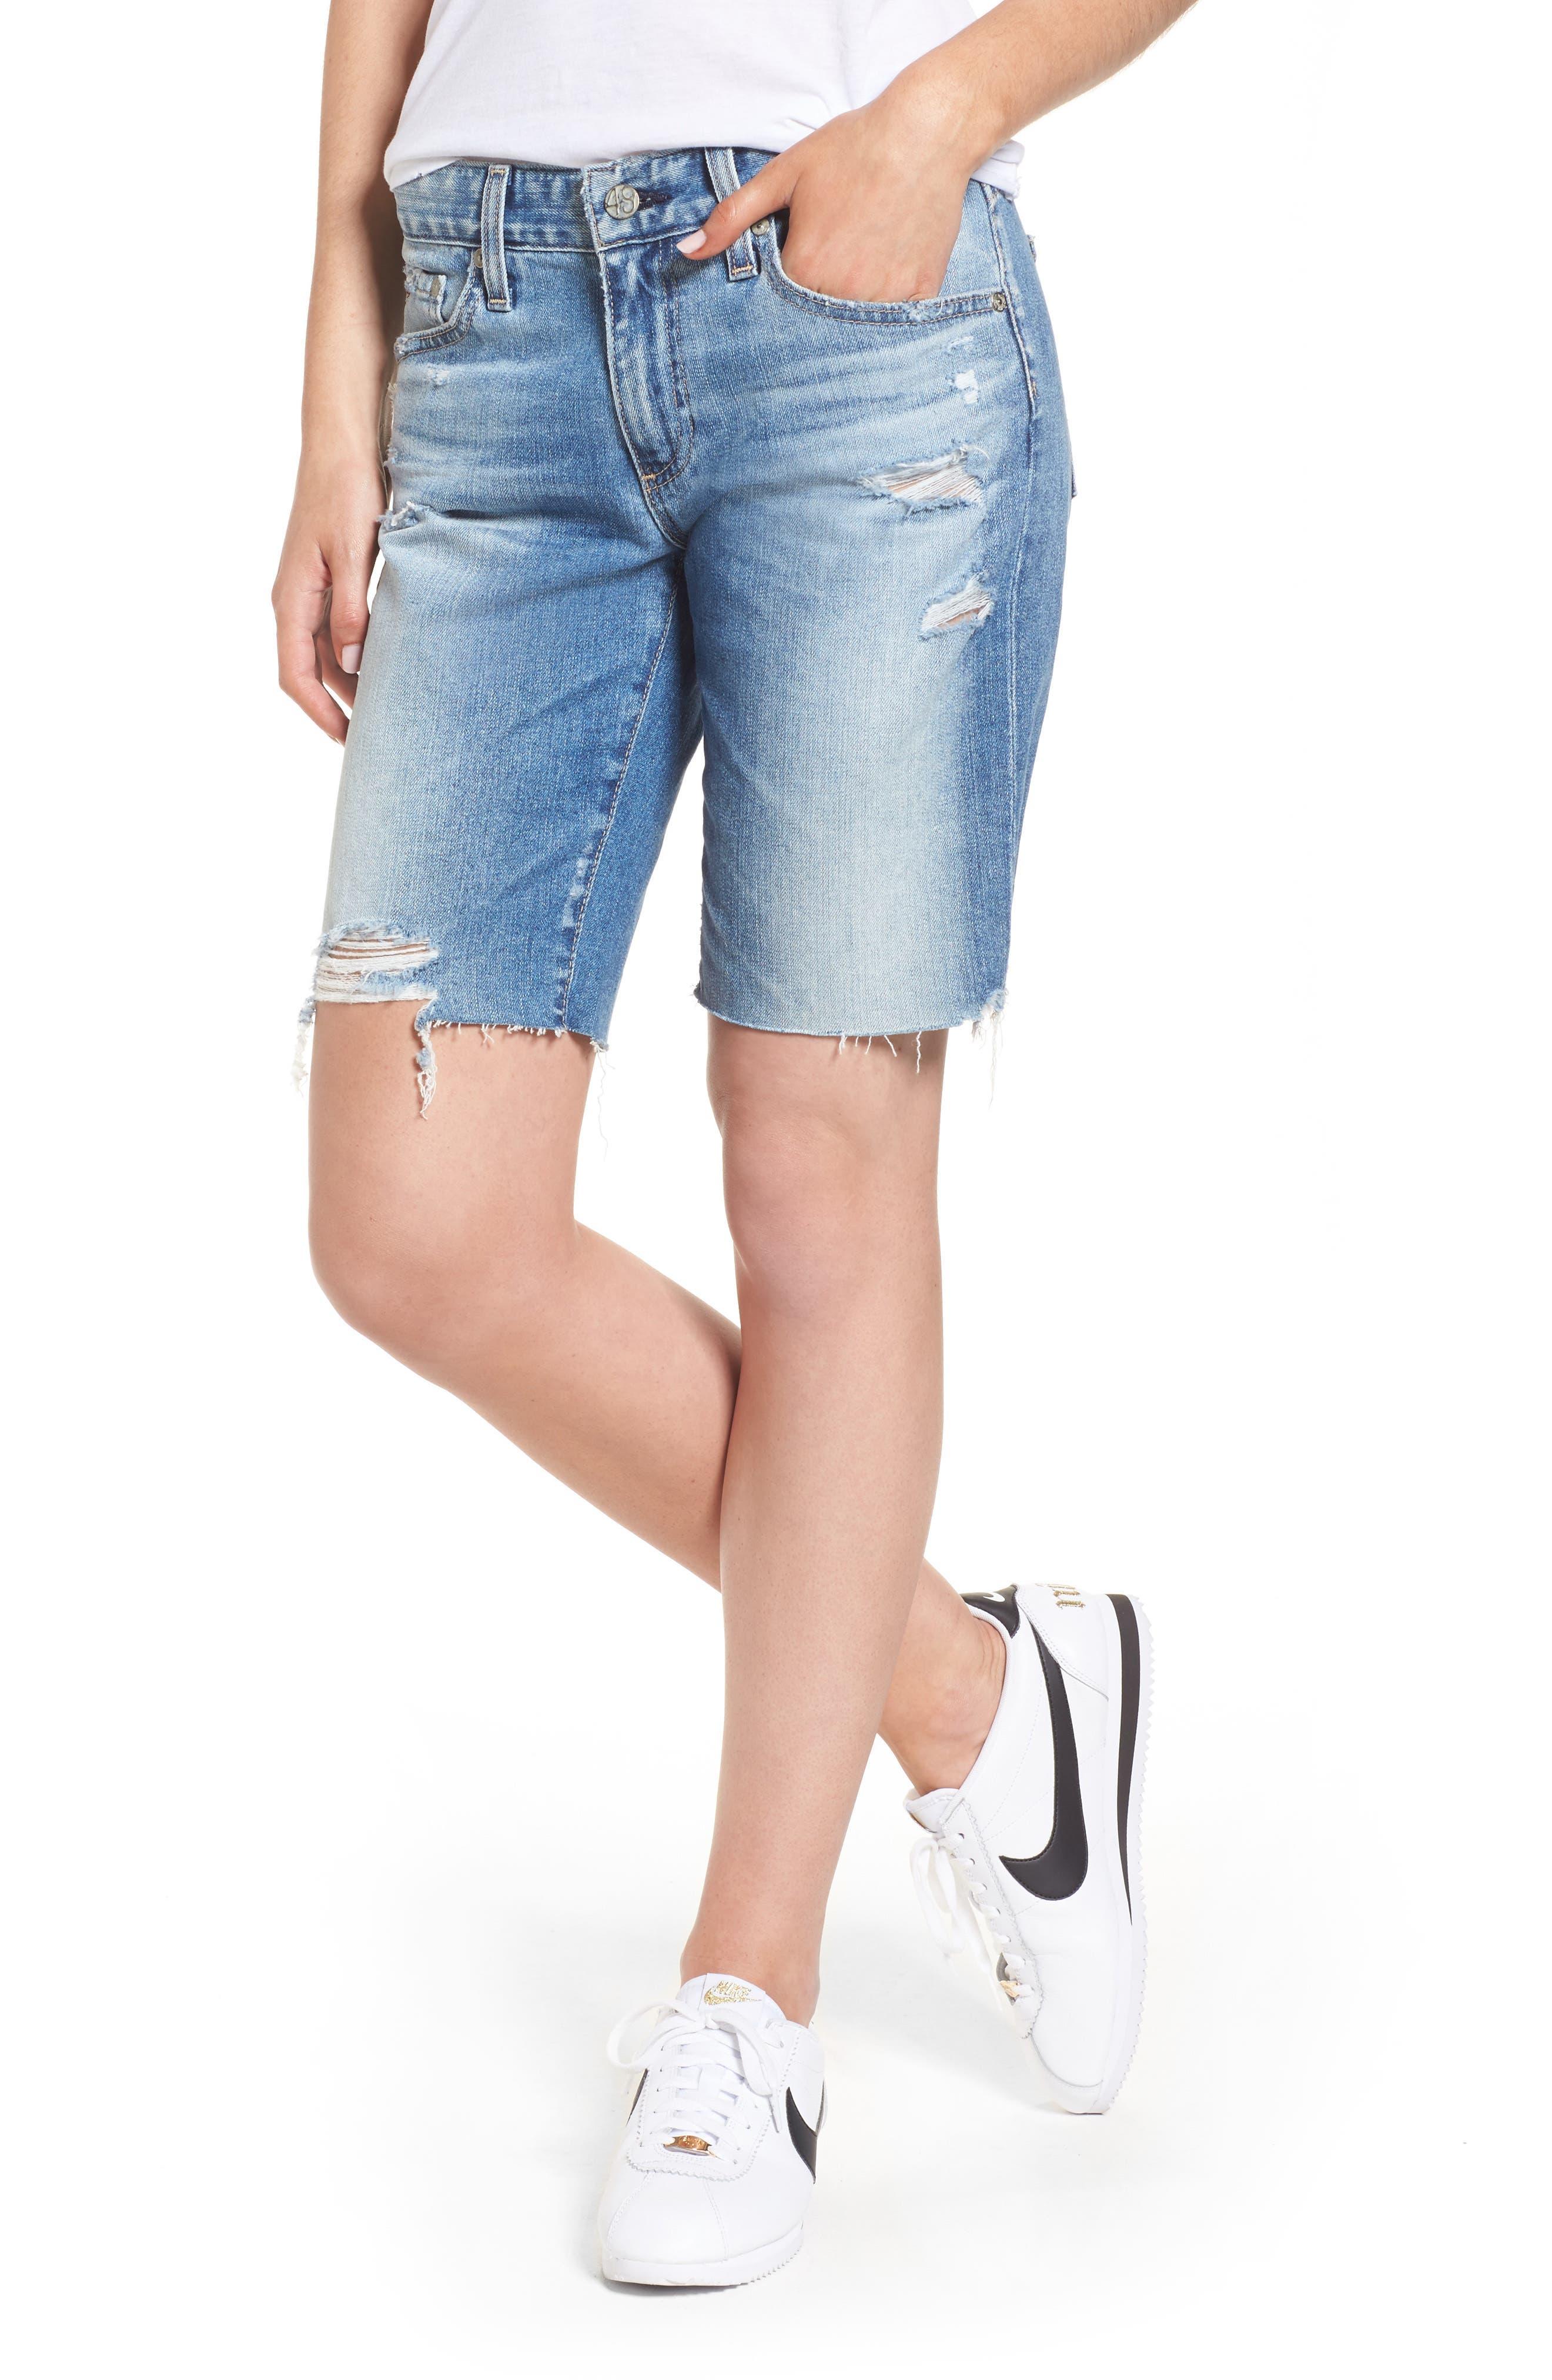 Nikki Cutoff Denim Shorts,                         Main,                         color, 16 YEARS INDIGO DELUGE DESTR